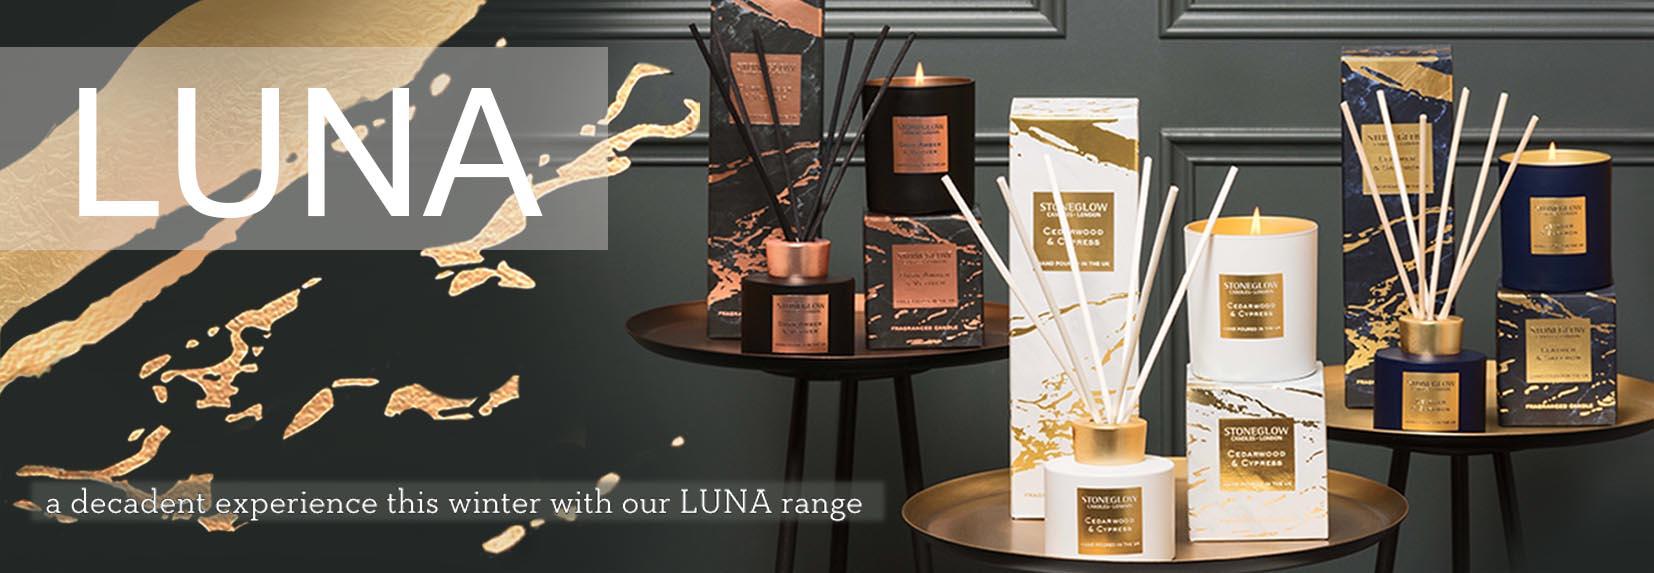 luna-website-cover.jpg